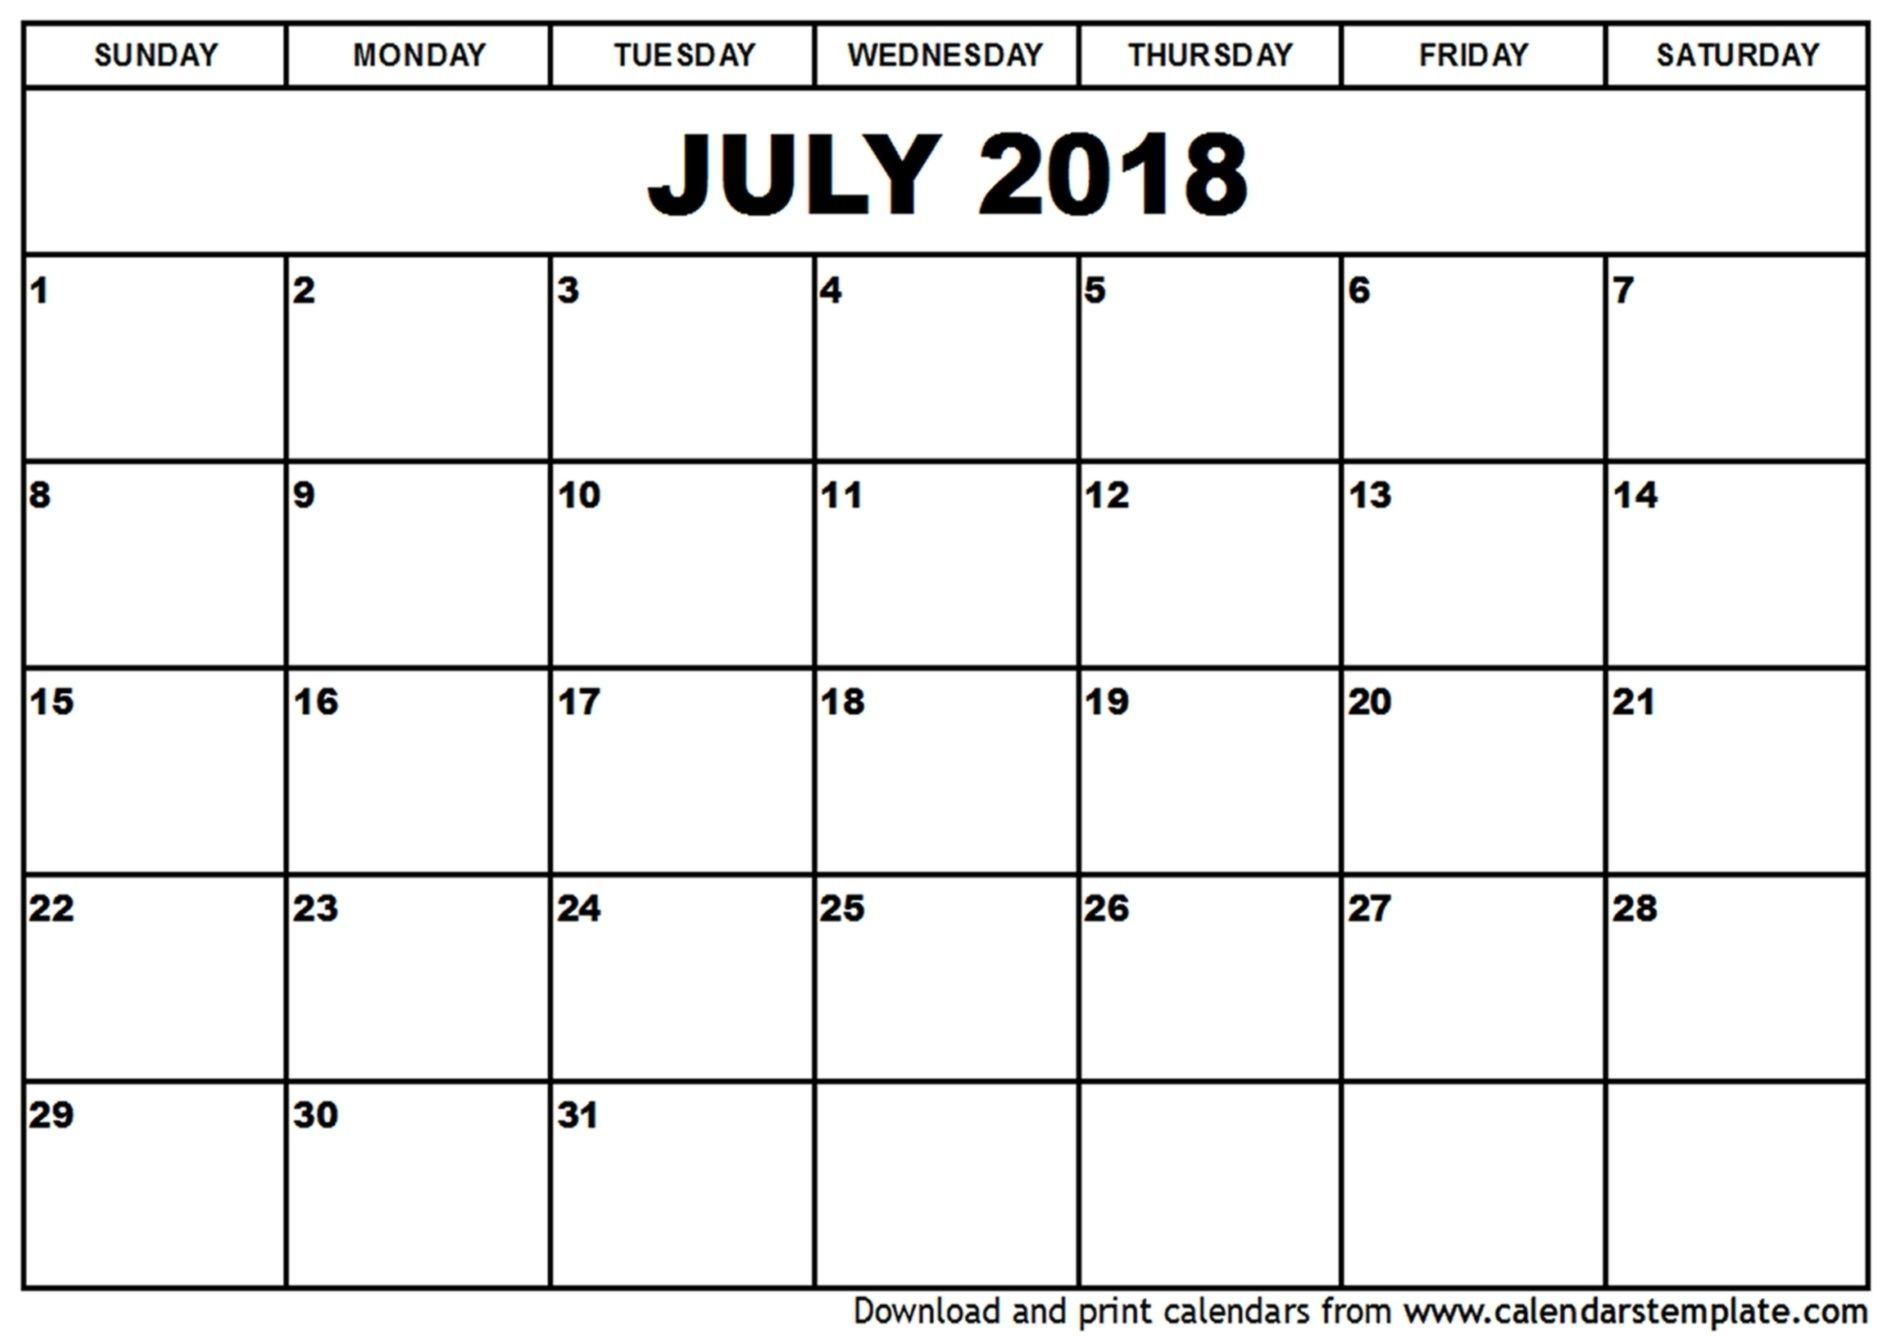 Free Printable 4X6 Monthly Calendar | Blank Monthly Calendar